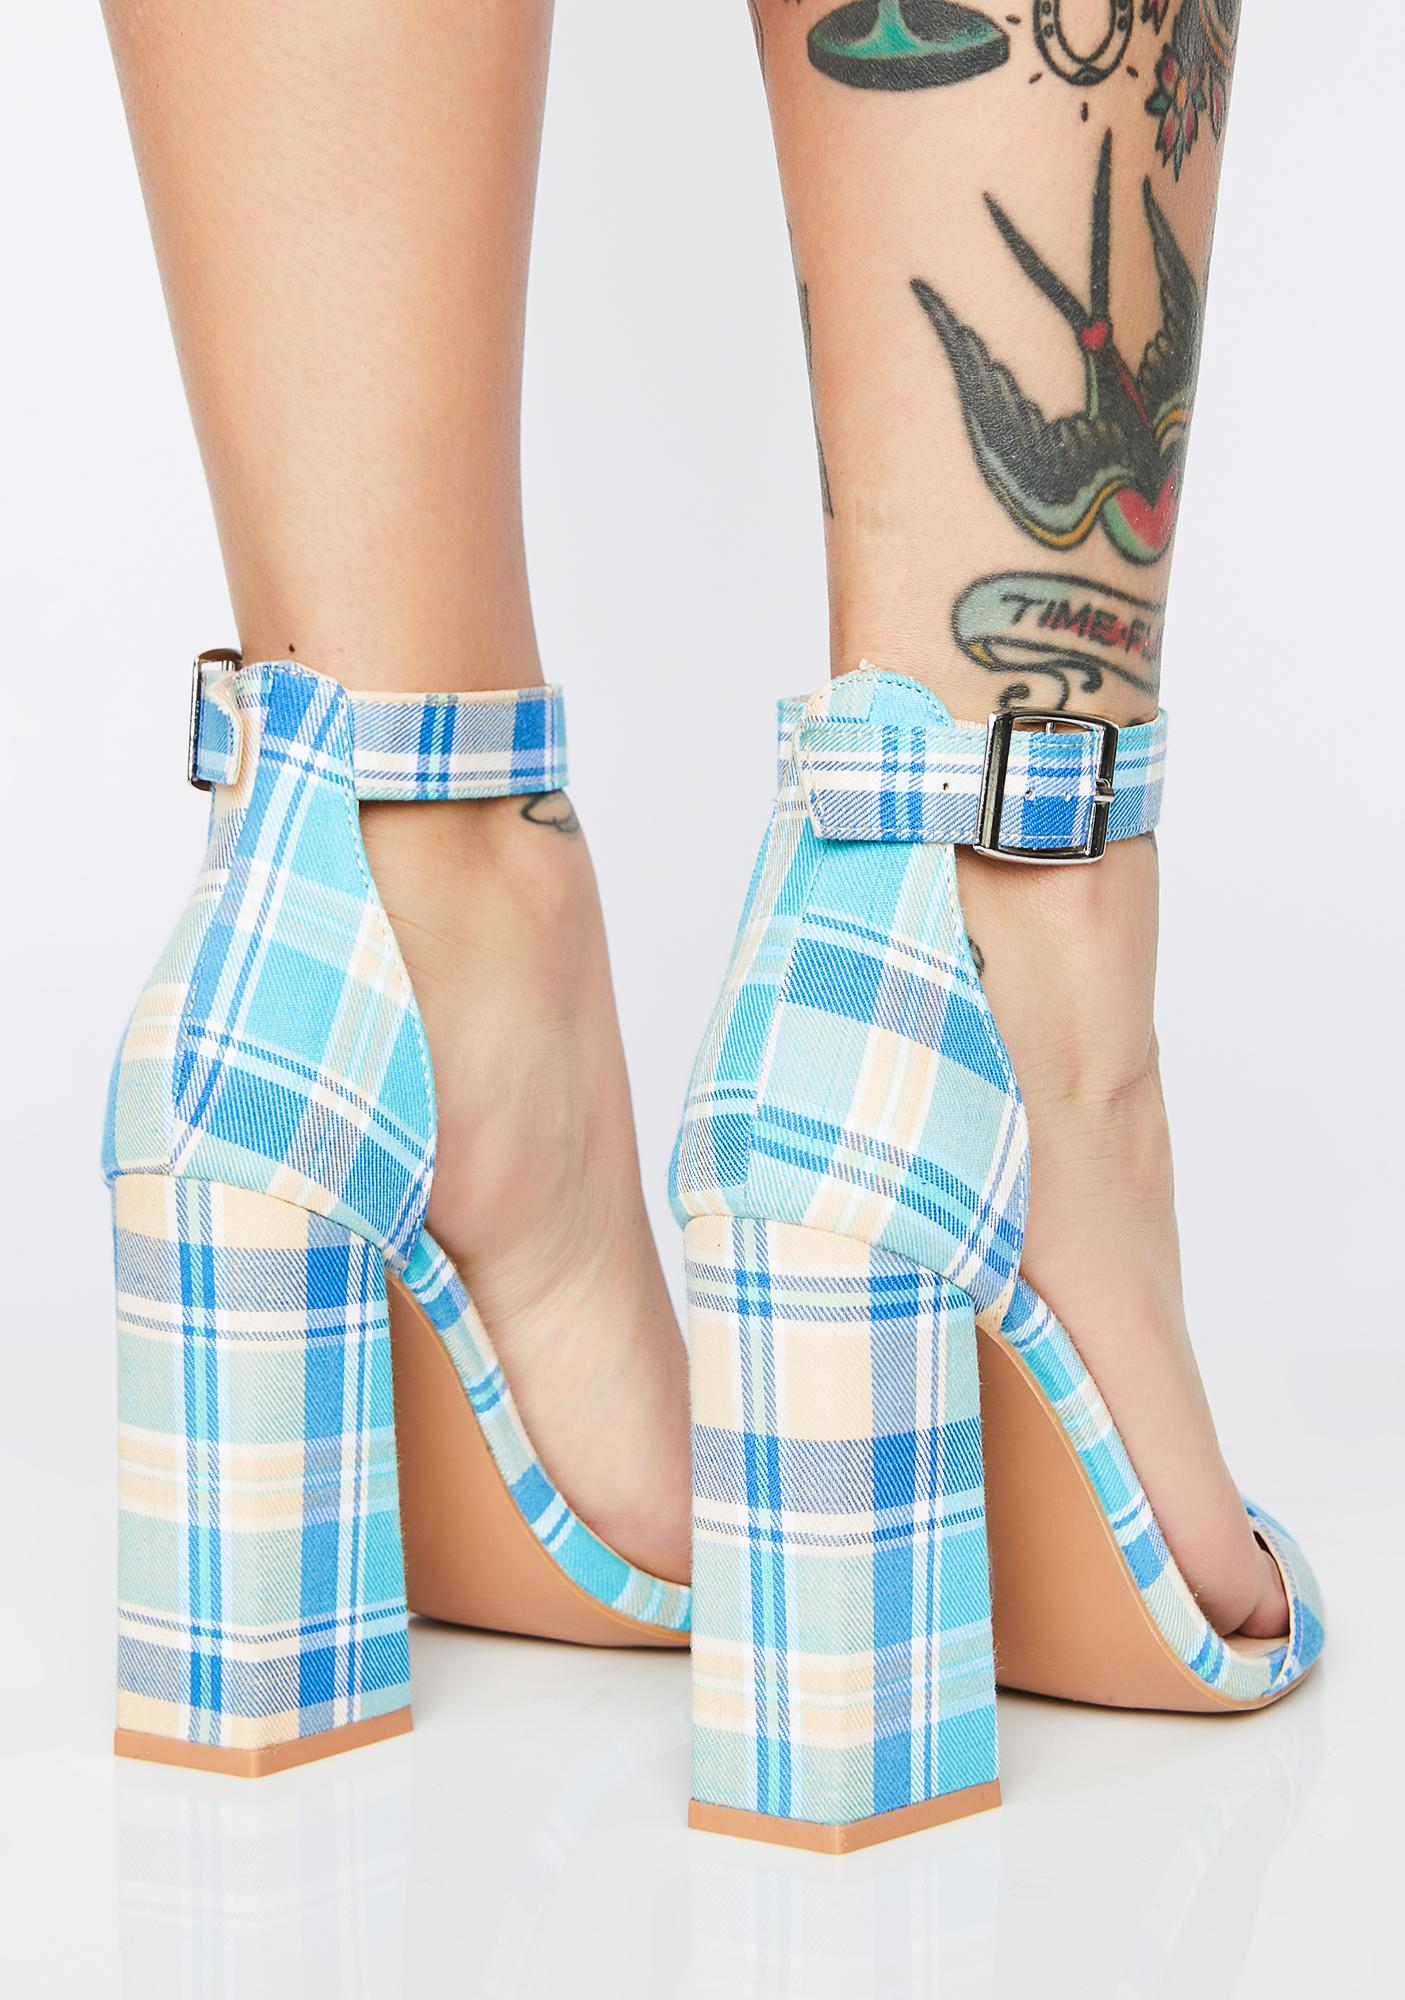 Just Flawless Plaid Heels